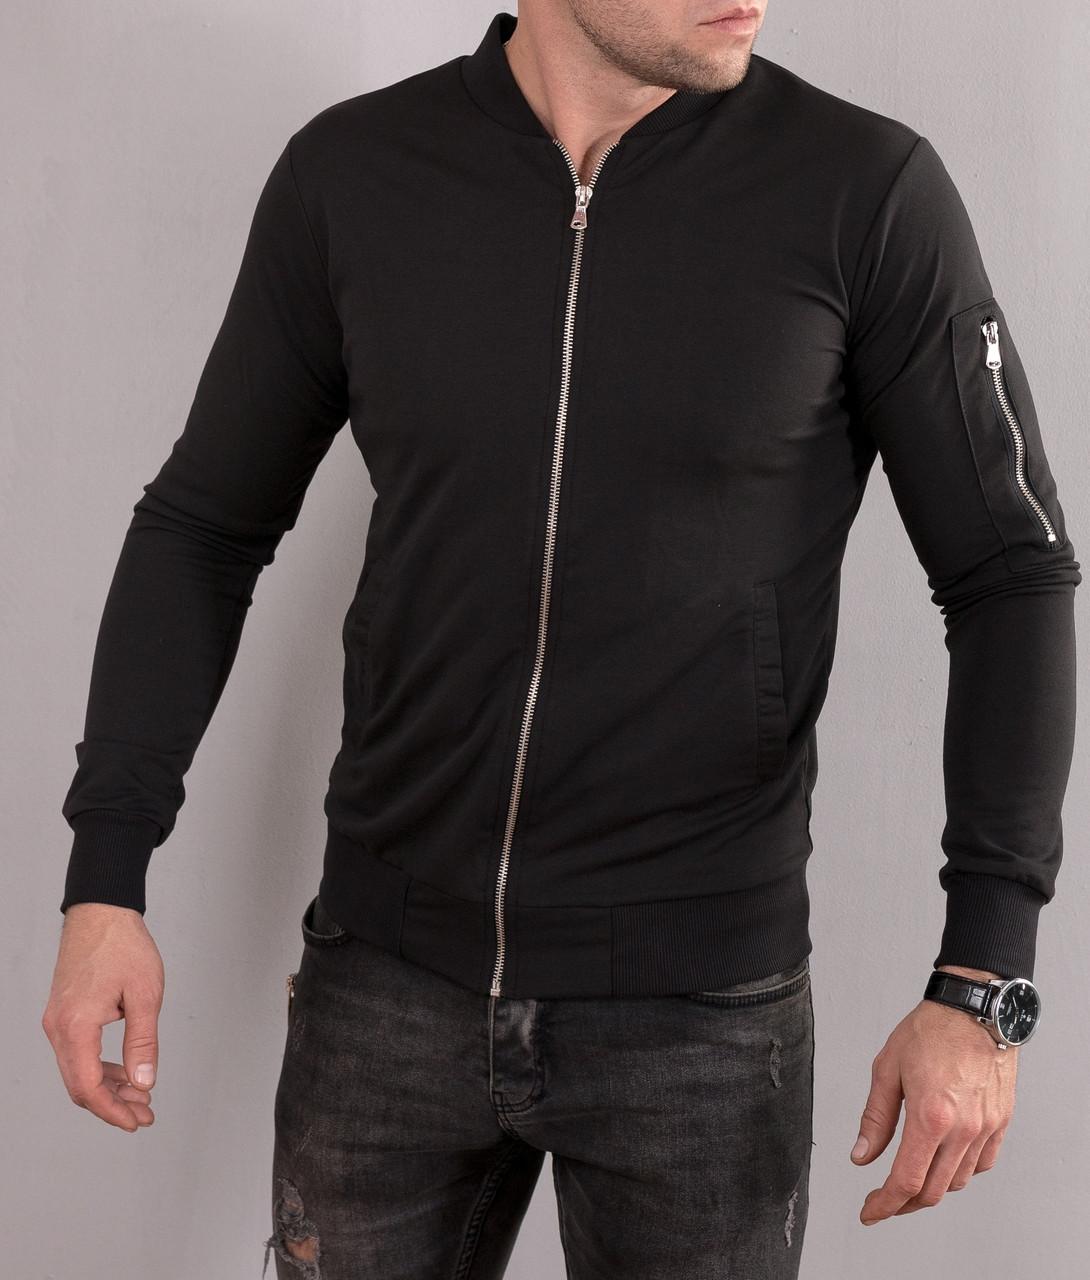 55cb5e7b140 Куртка мужская бомбер   летняя   весенняя   черная  продажа